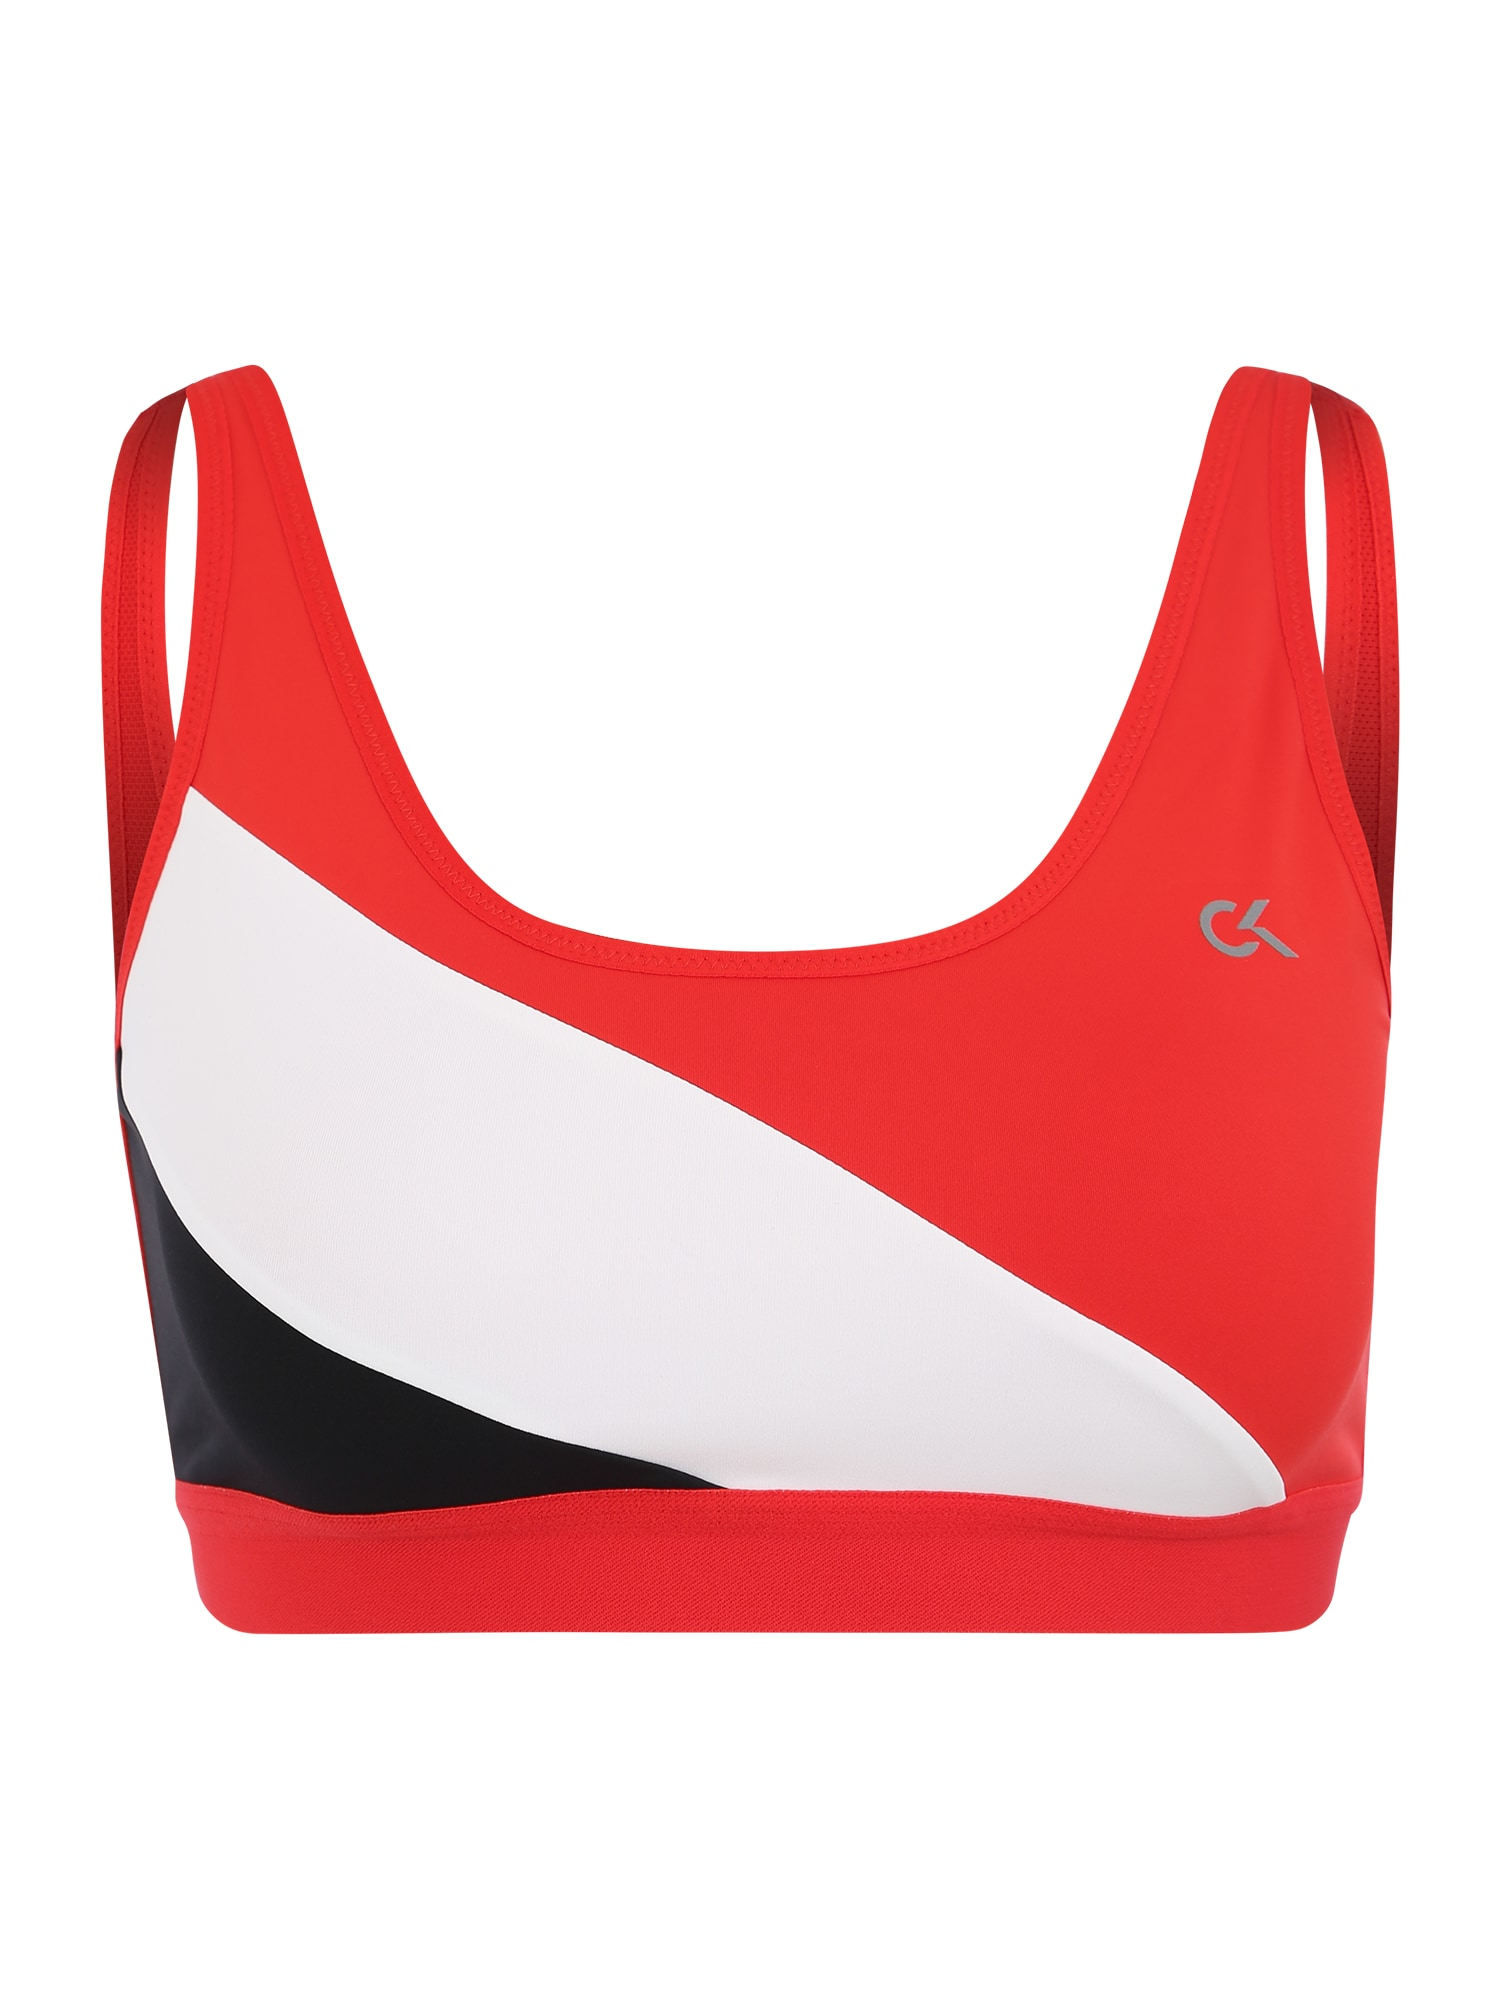 Sportovní podprsenka červená bílá Calvin Klein Performance